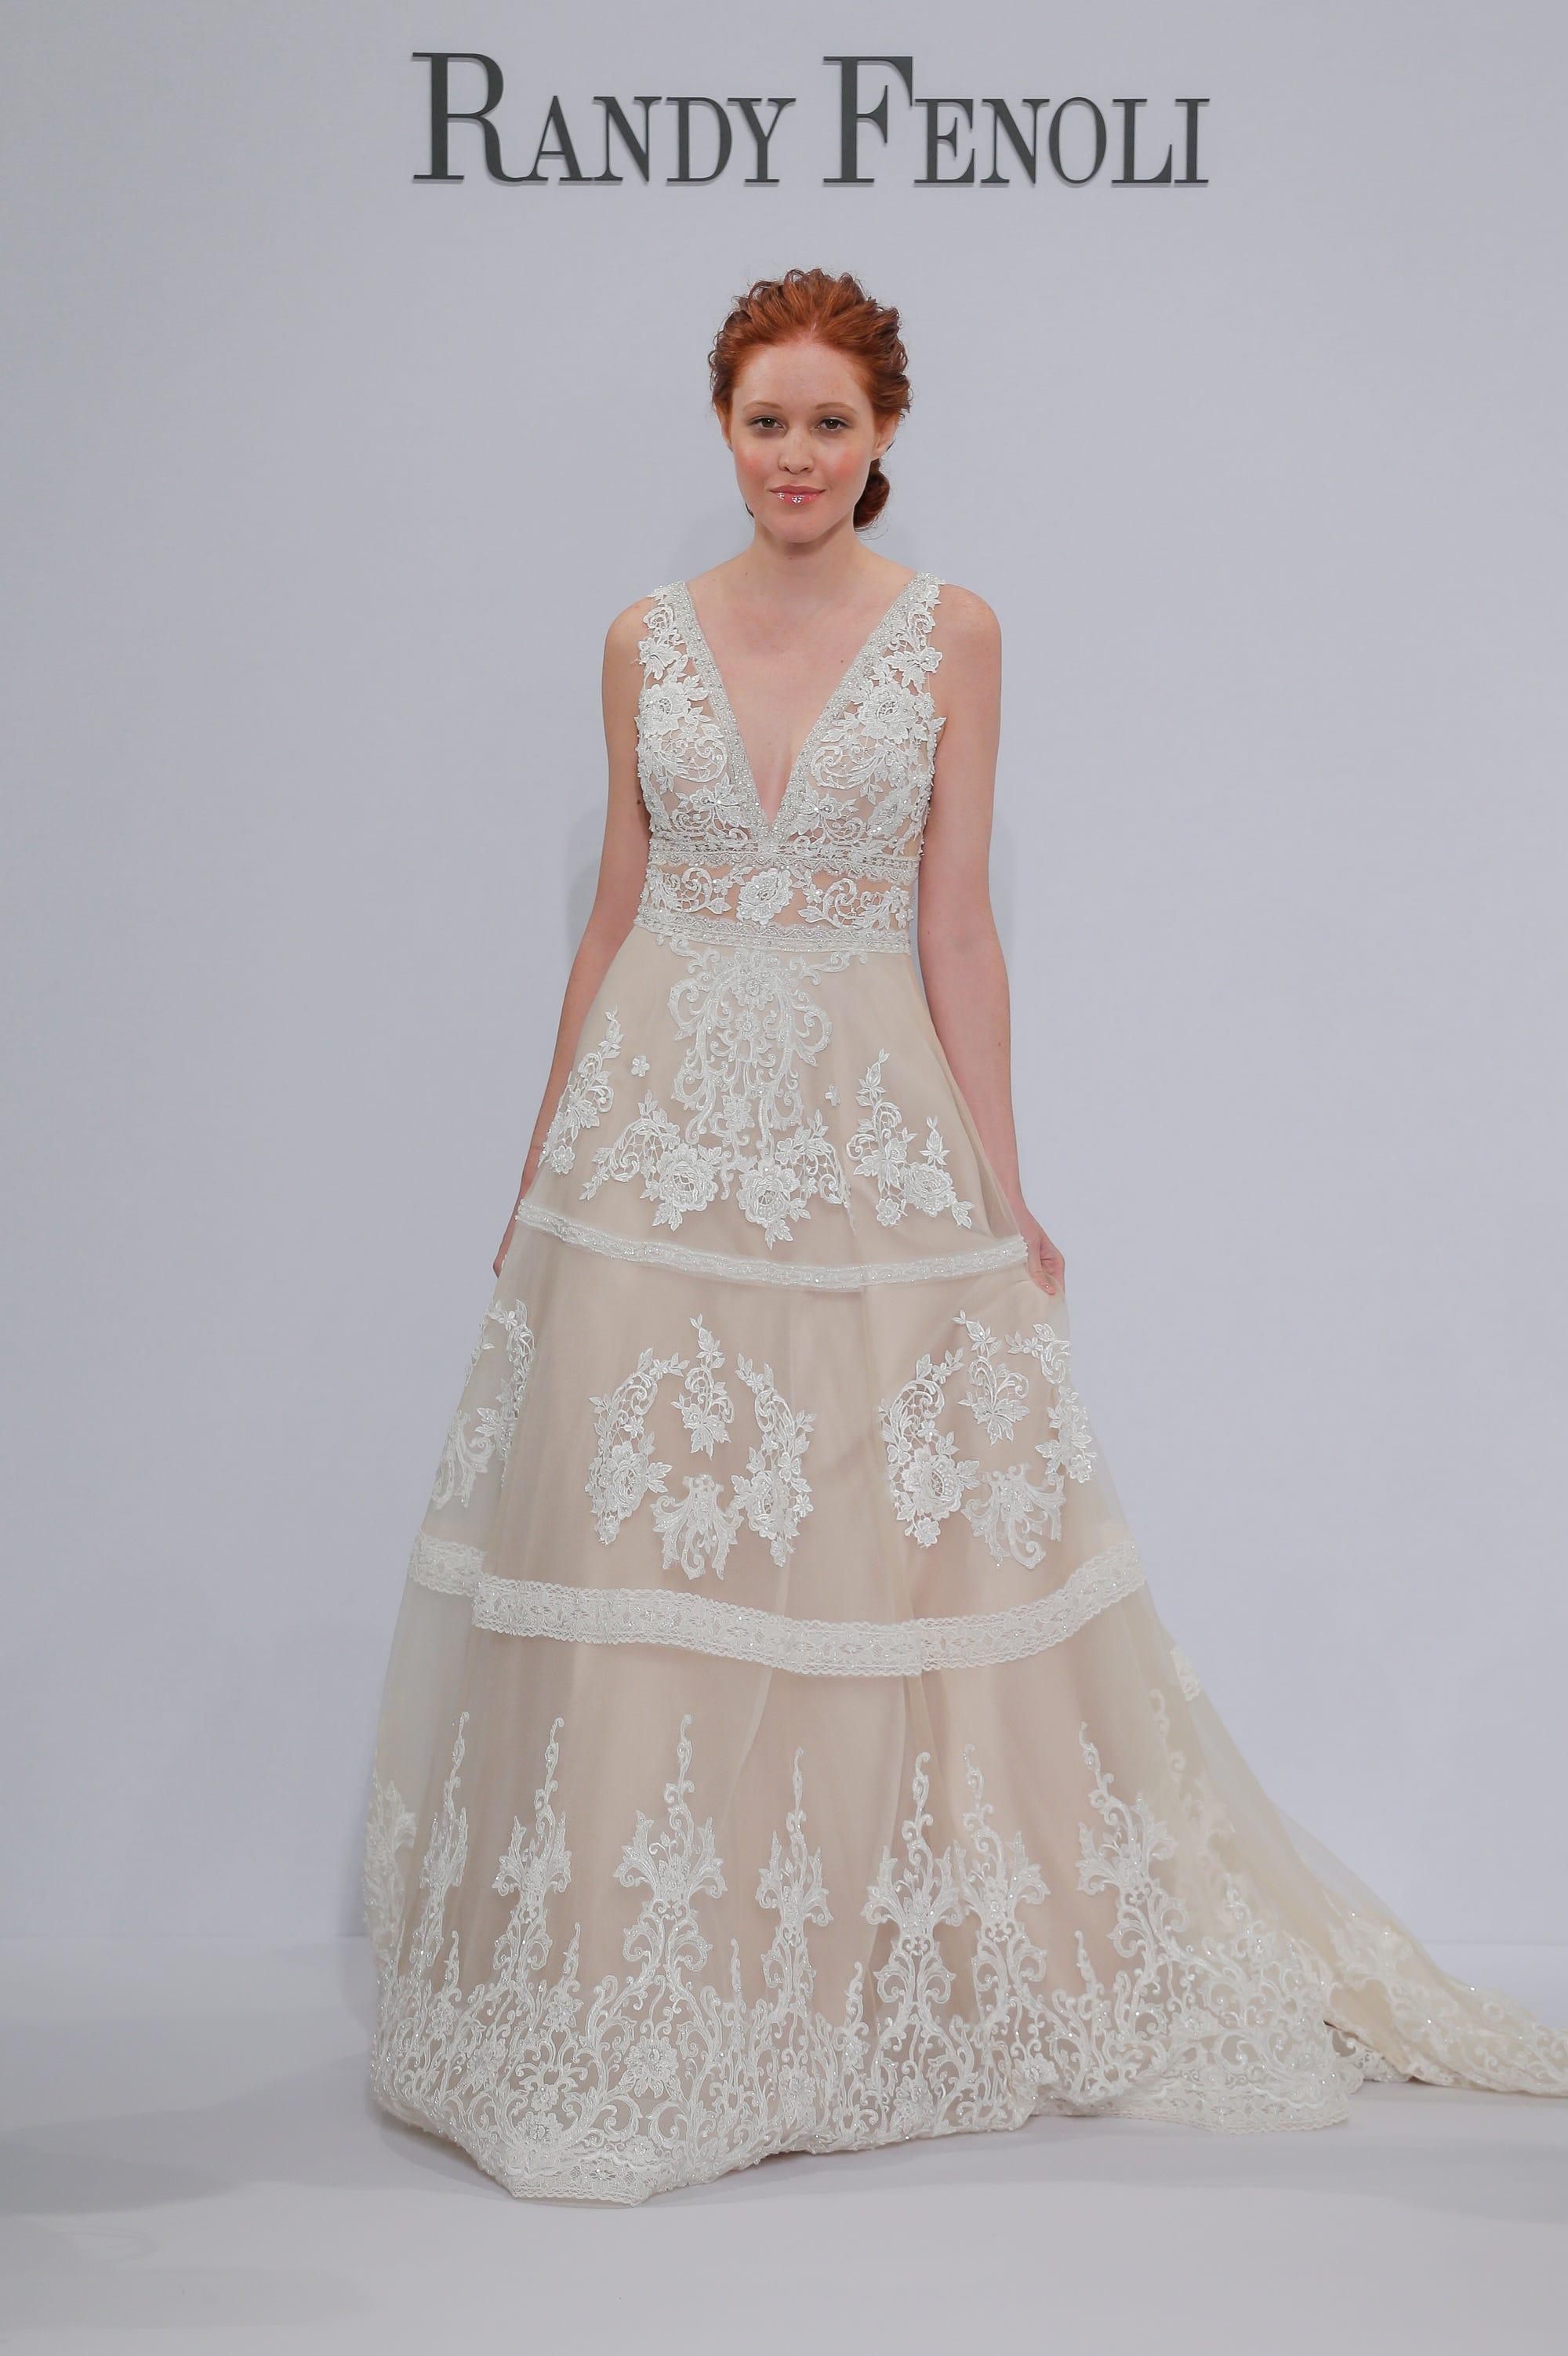 Randy Fenoli Wedding Dresses.Say Yes To The Dress Randy Fenoli Debuts Bridal Line